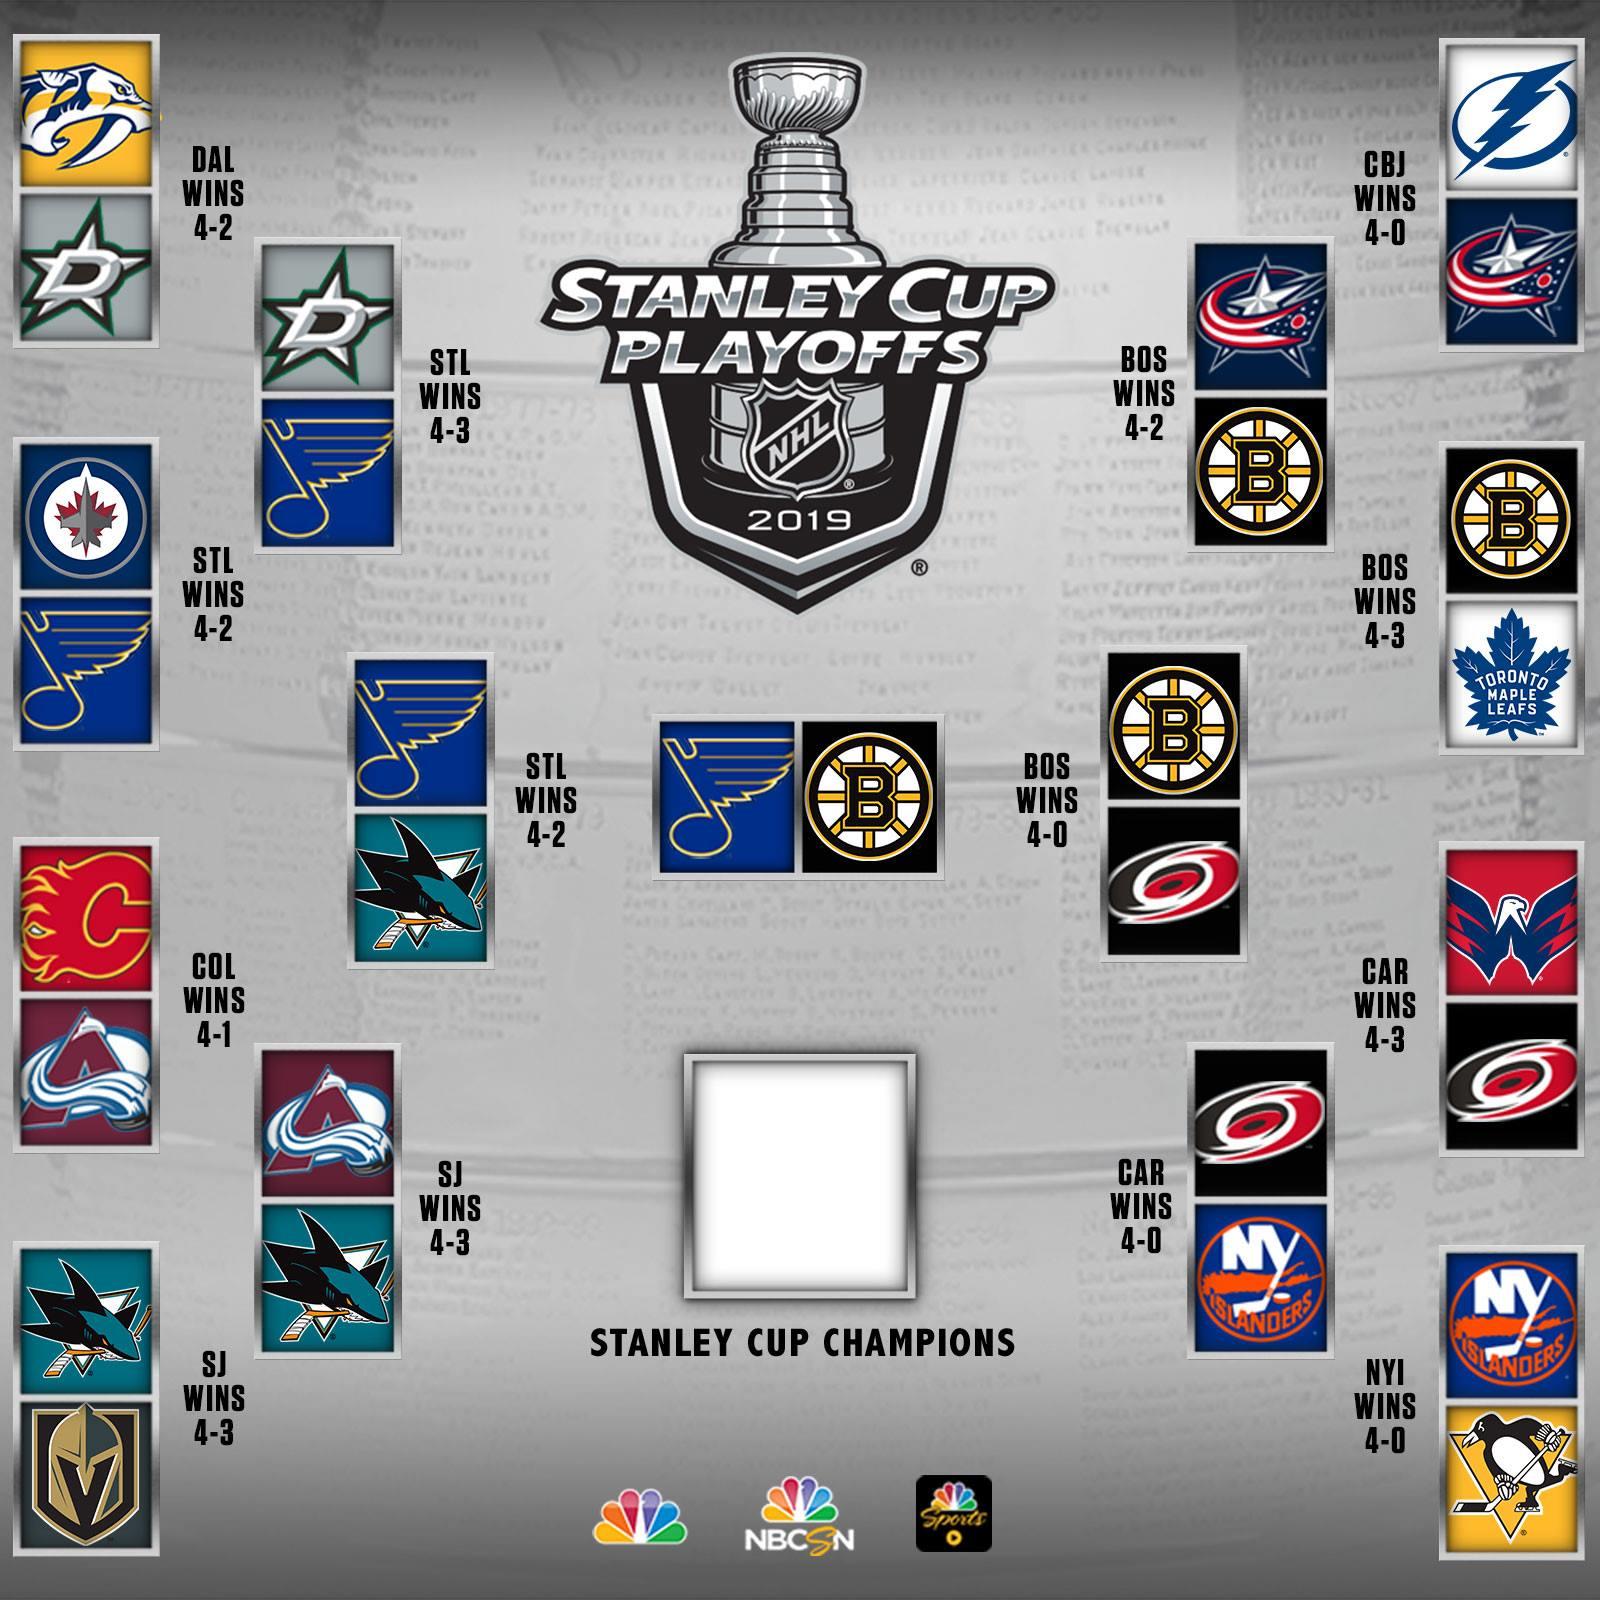 2013 Nhl Playoff Bracket Printable Nhl Playoff Bracket 2013 Nhl Playoffs Playoffs Hockey Playoffs